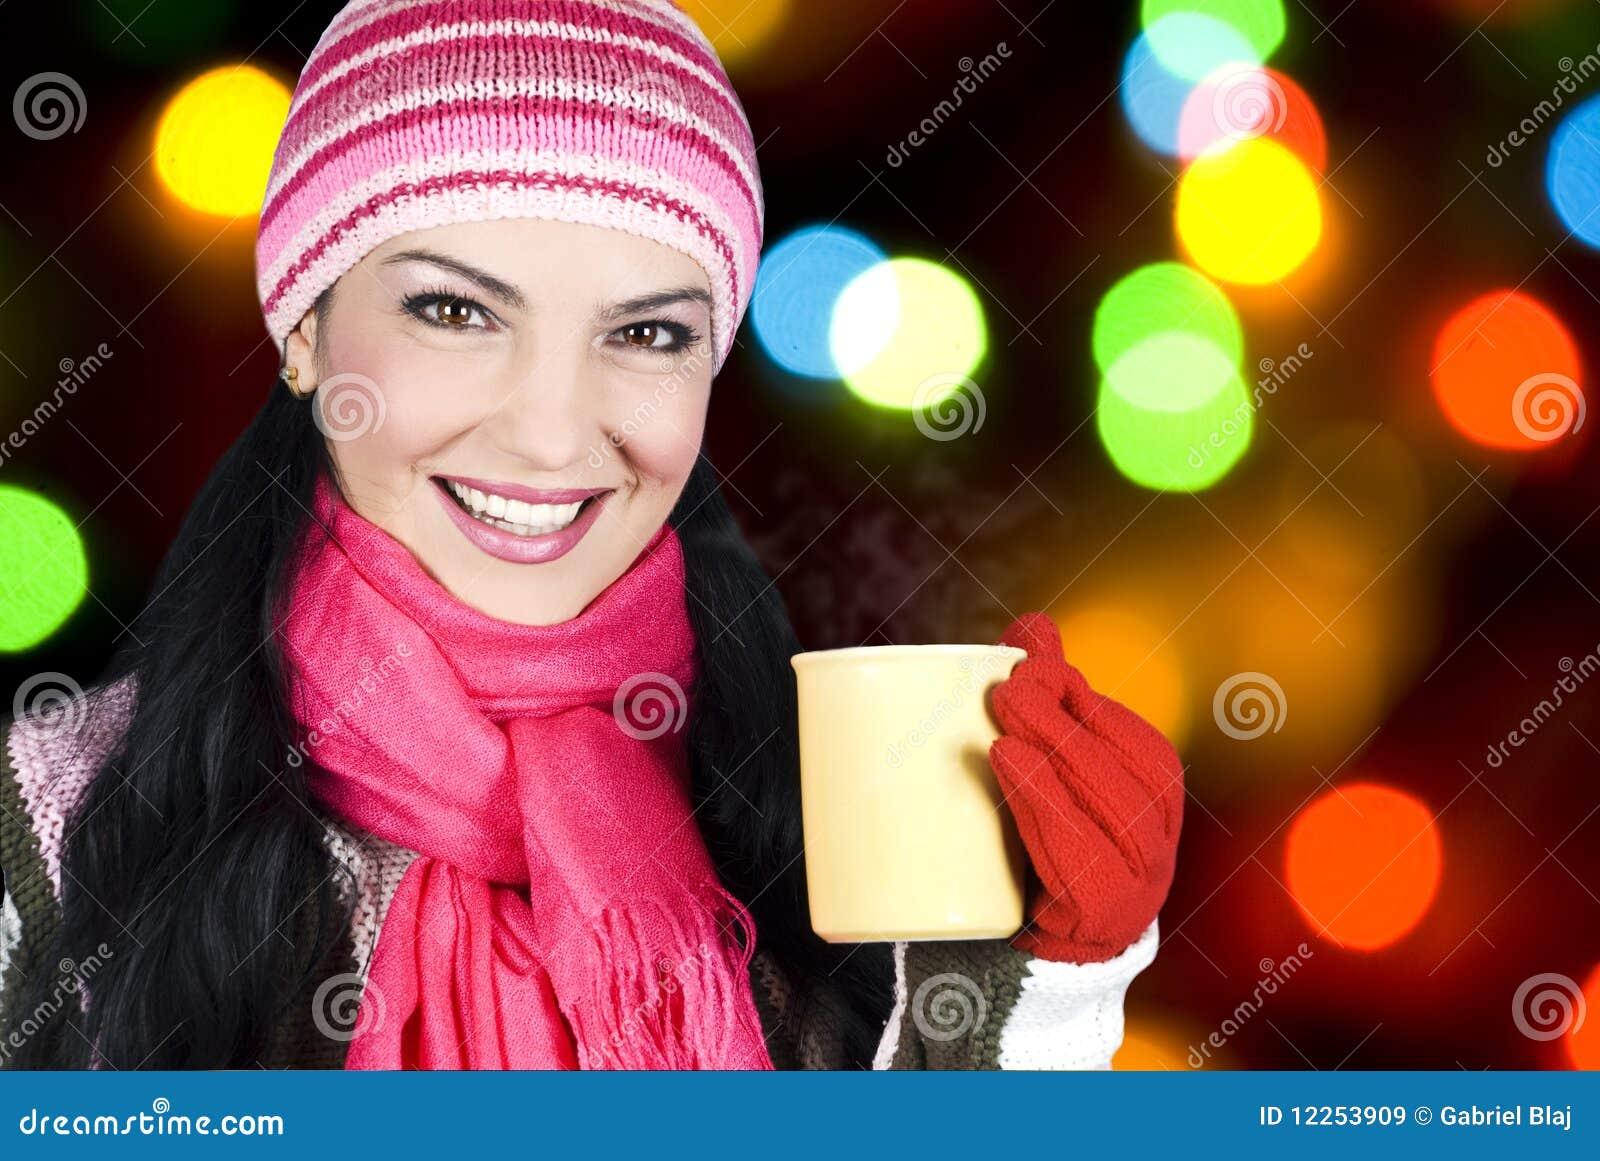 Lächelnde Winterfrau, die heißen Tee anhält